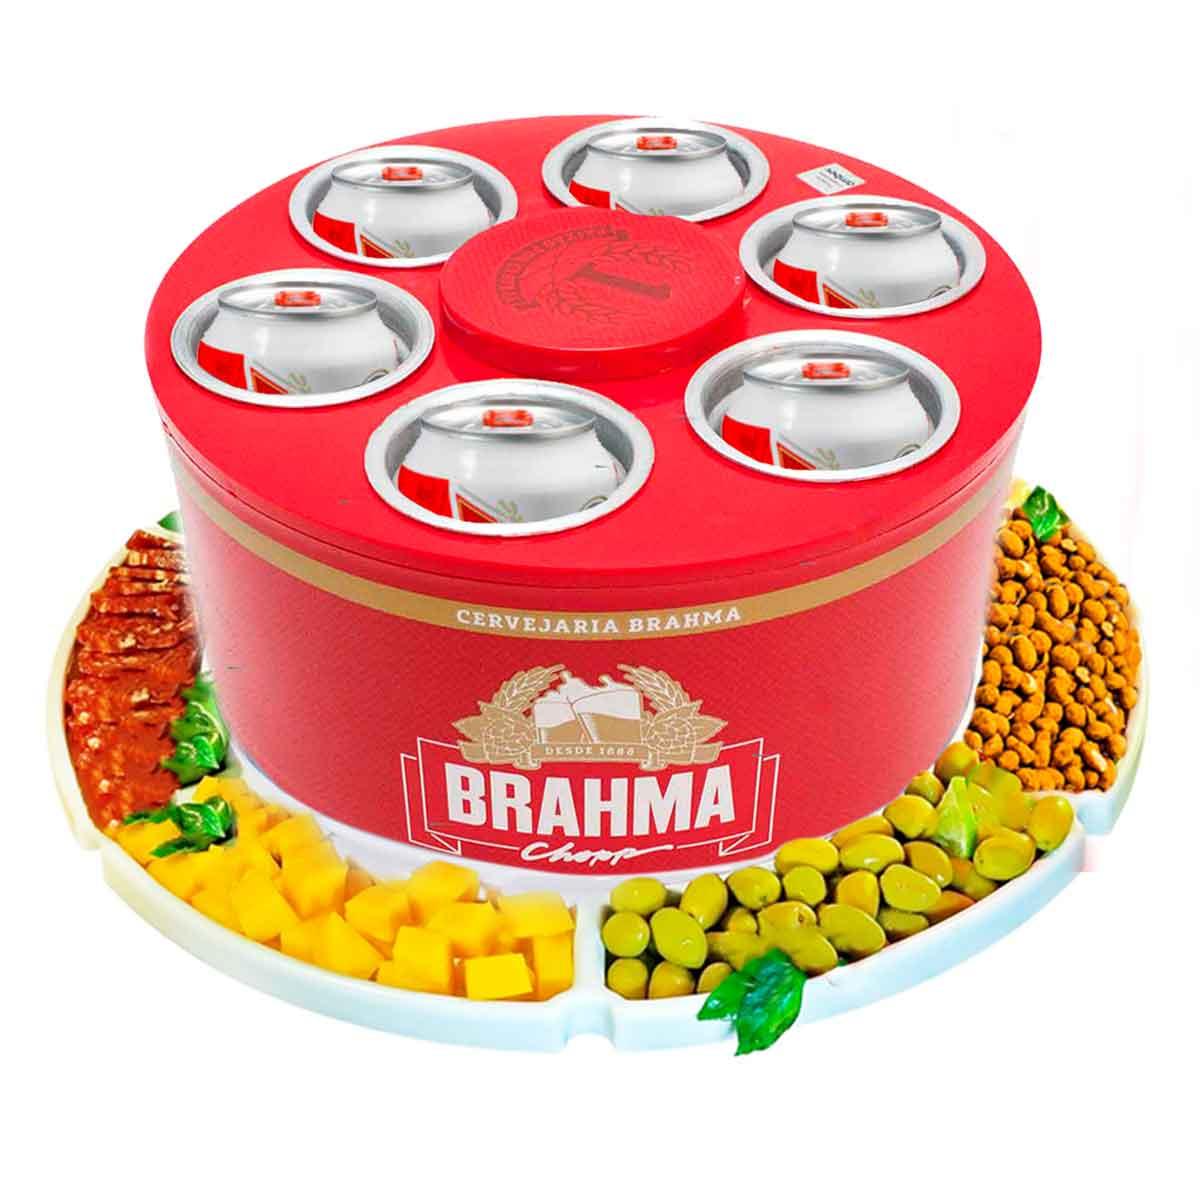 KIT Cooler 3G Brahma 6 Latas Cerveja + Petisqueira Giratória